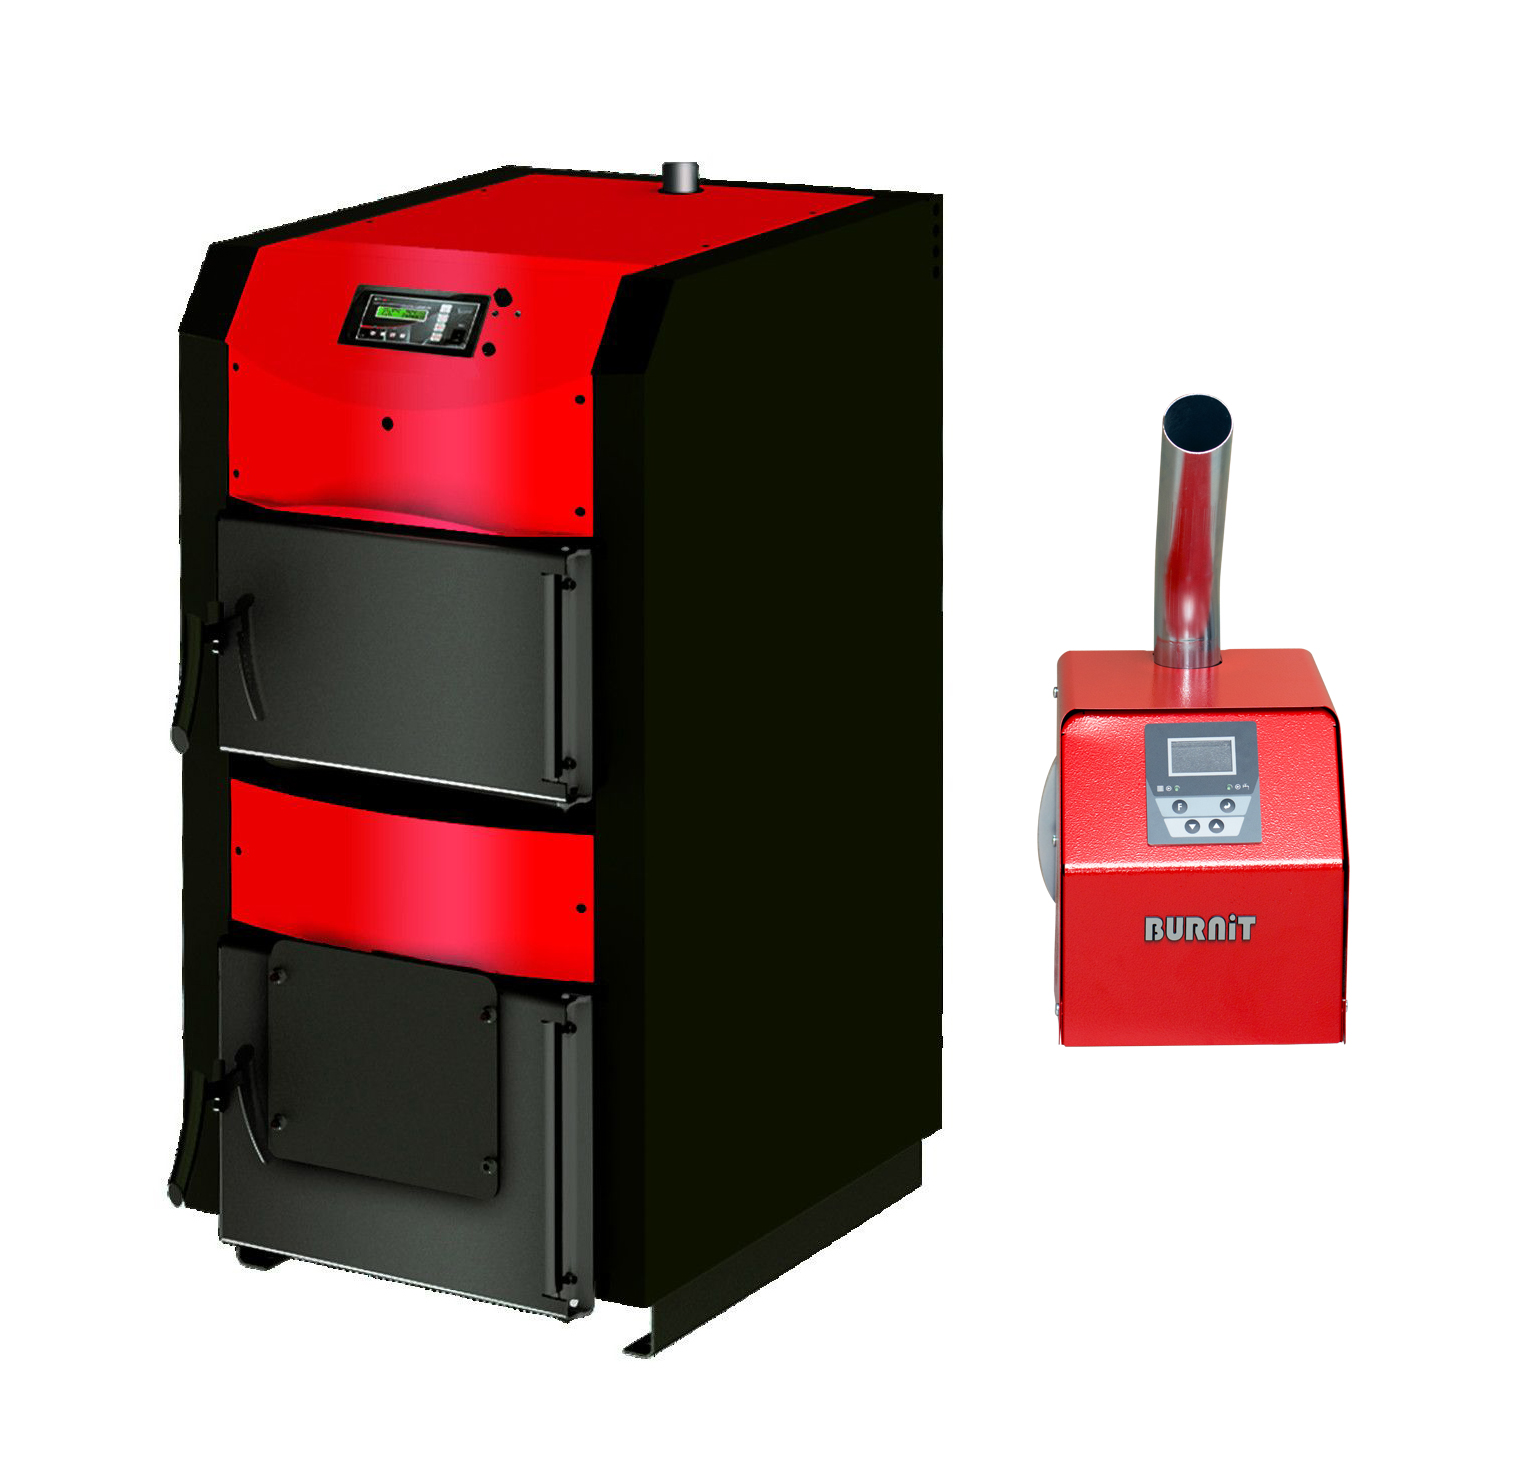 Pachet centrala mixta lemn si peleti Sunsystem Burnit WBS-ACTIVE 90 kw, cu ventilator, automatizare, si arzator Peleti Pell Eco 70 kw, snec, aprindere automata imagine fornello.ro